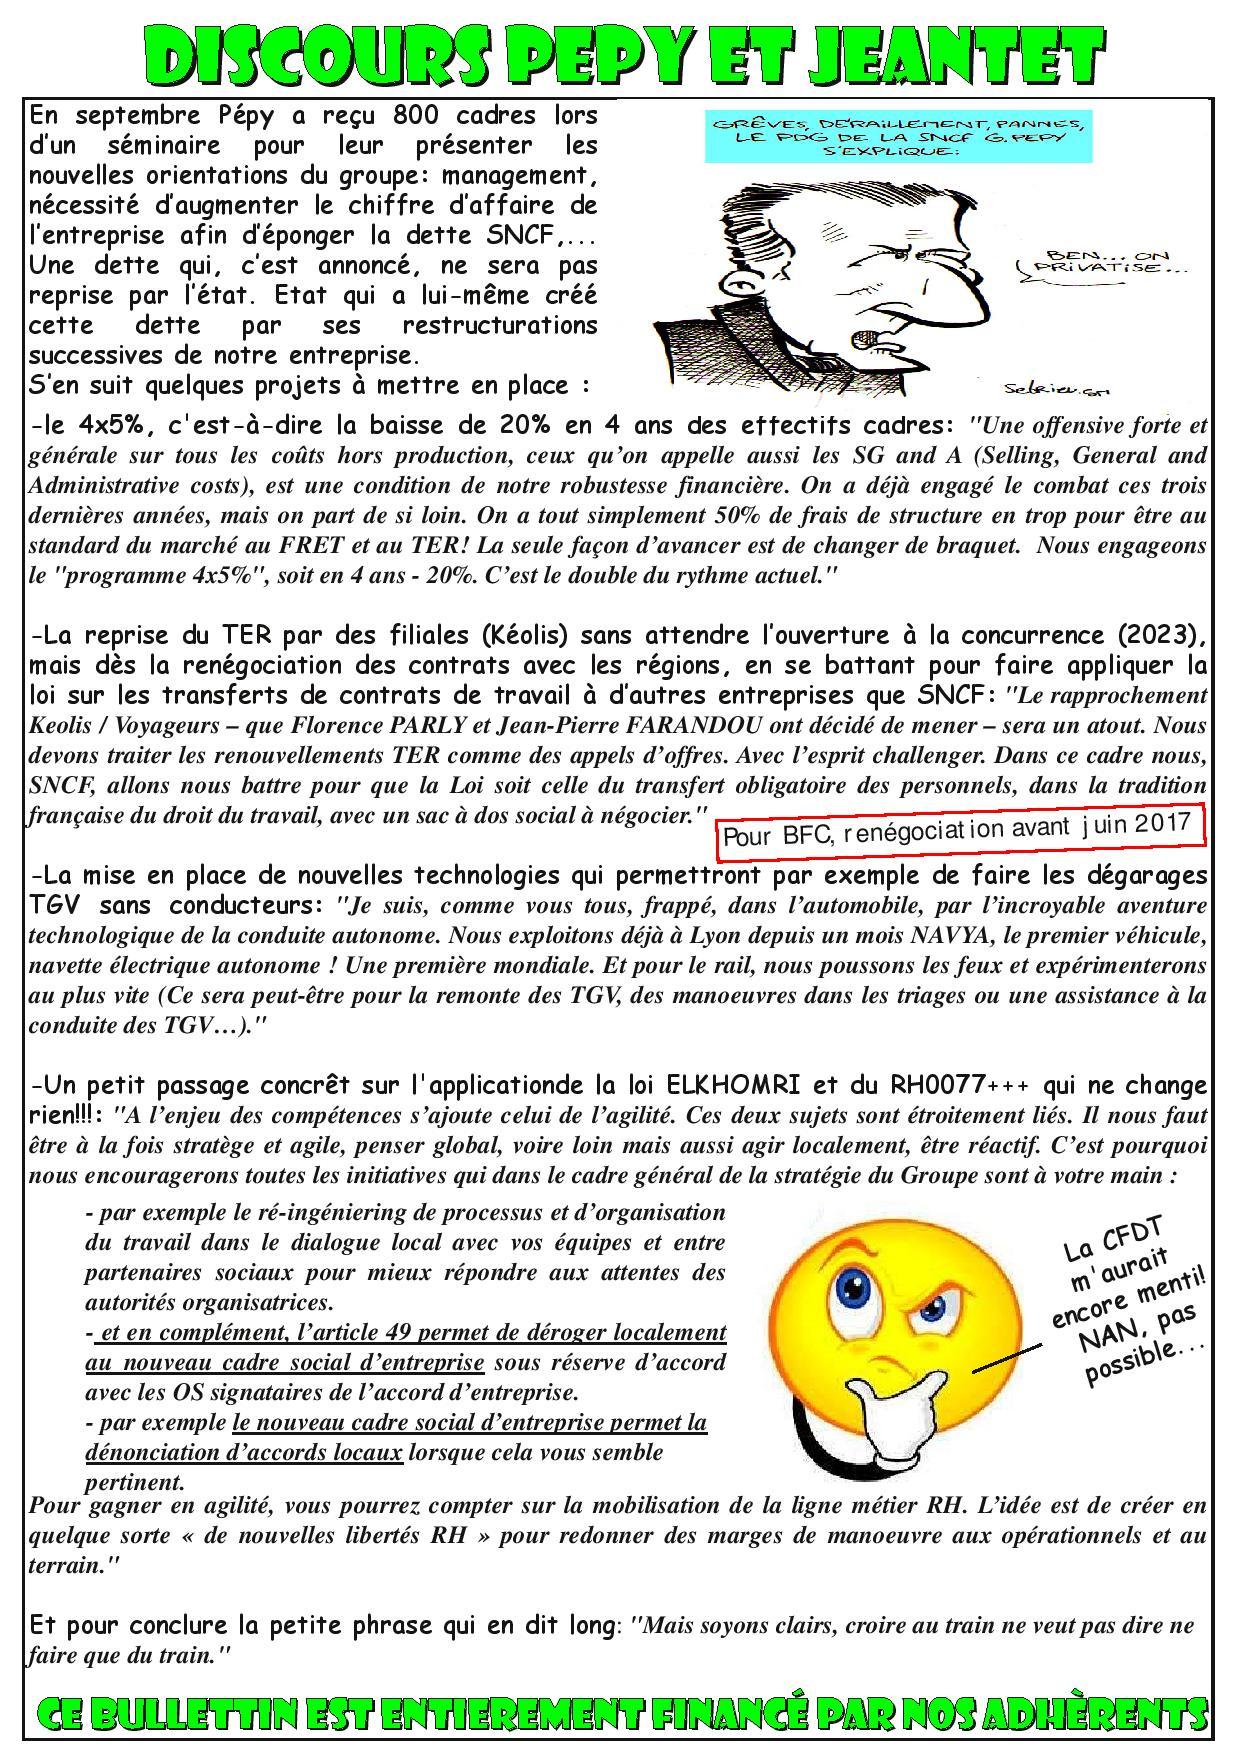 crdp-upt-lar-09-2016-page-008